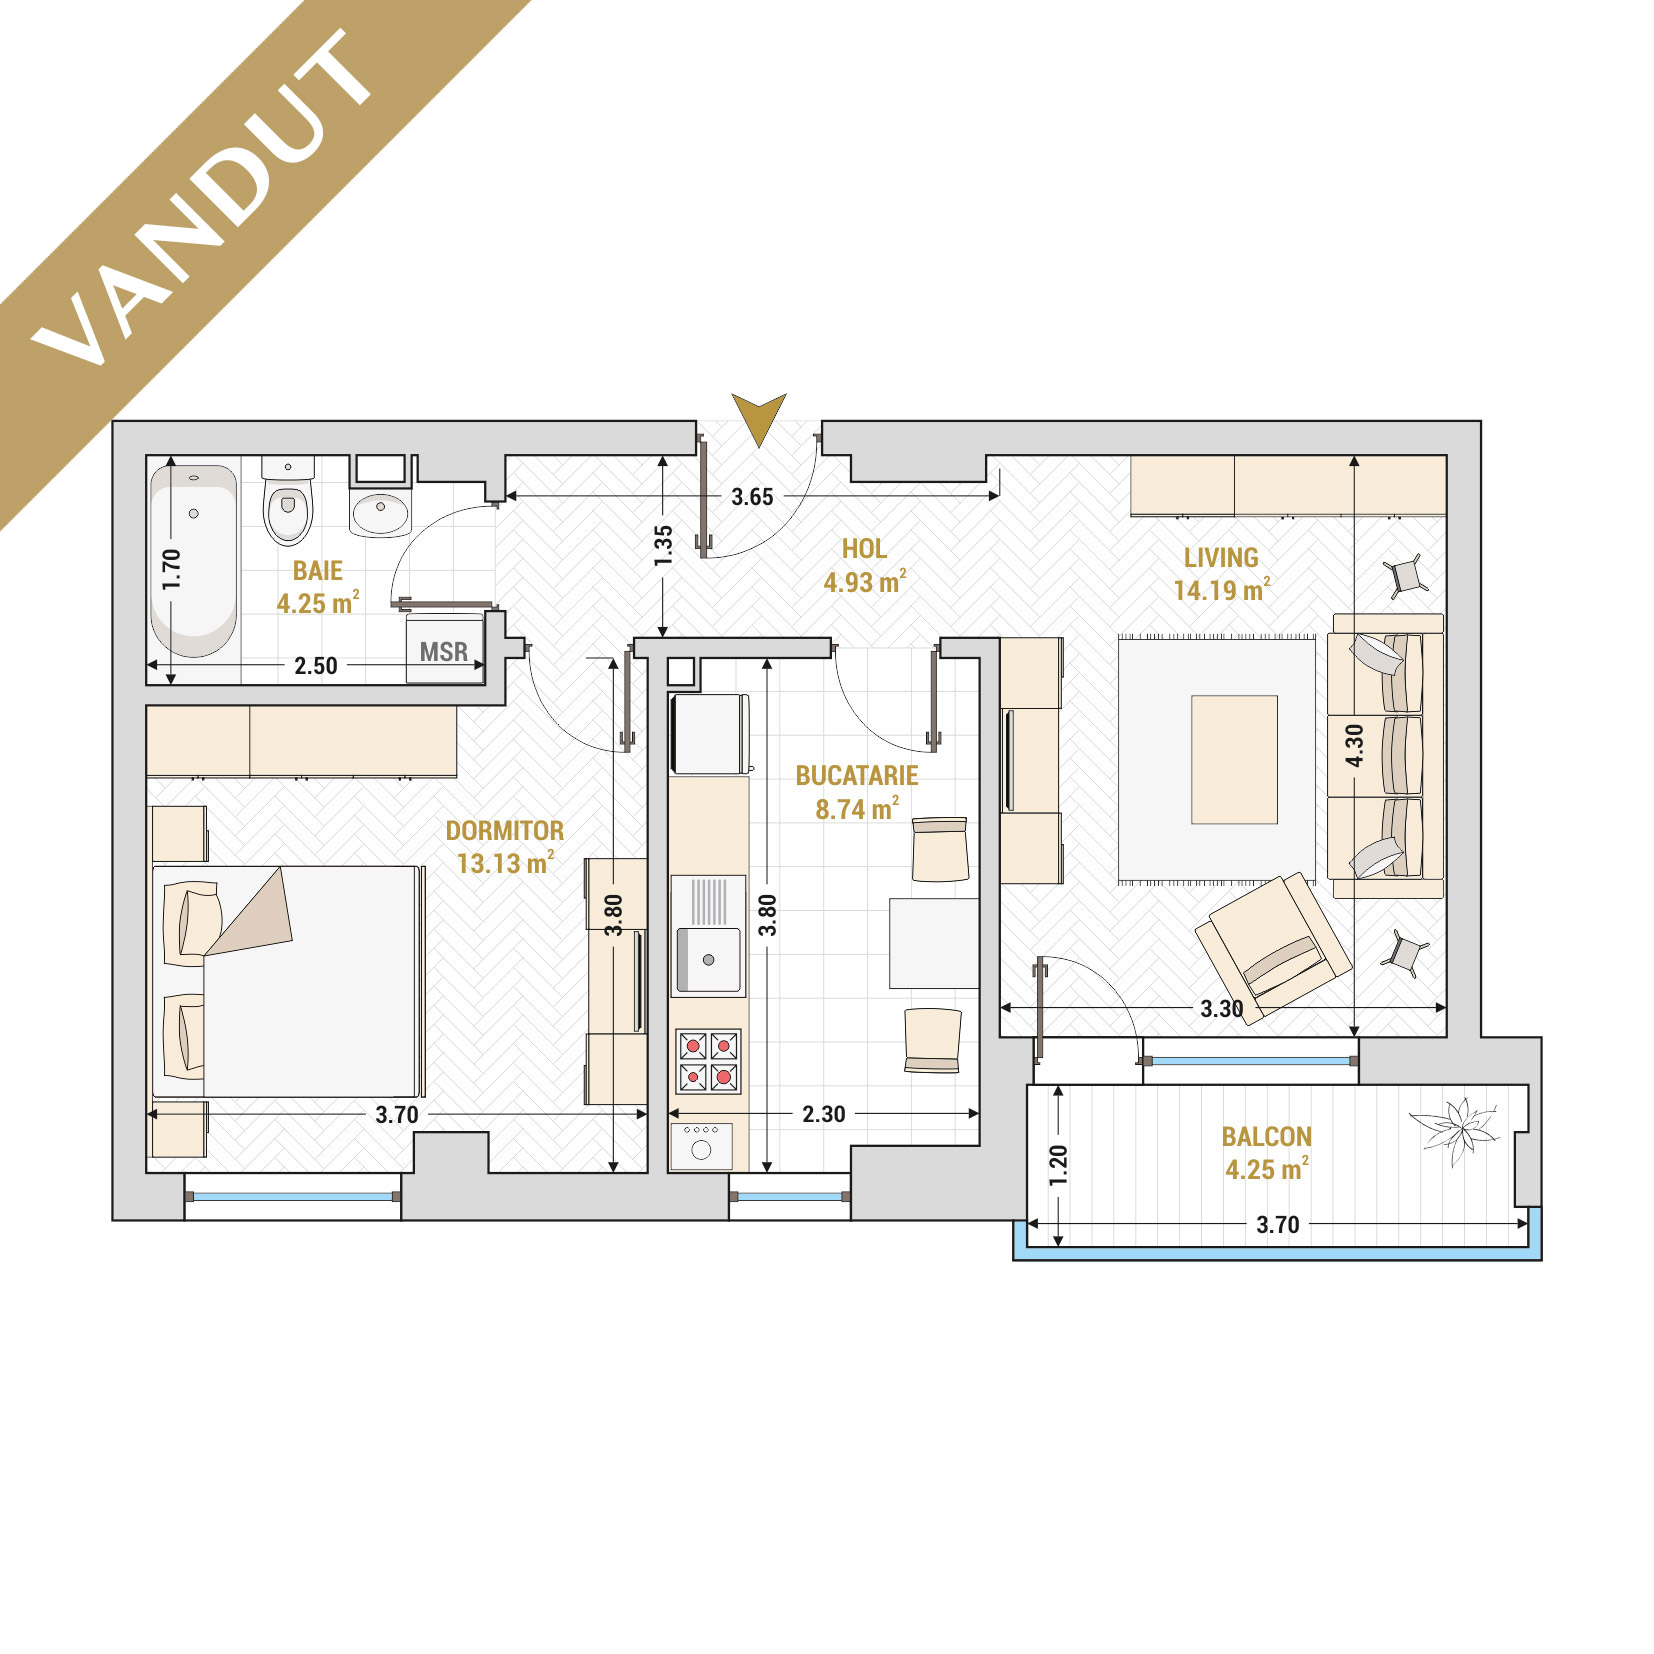 Apartament 2 camere de vanzare Bucuresti - Catedral Residence - Marriott, Piata Unirii, 13 Septembrie, Izvor - Tip 3 - T1 - VANDUT